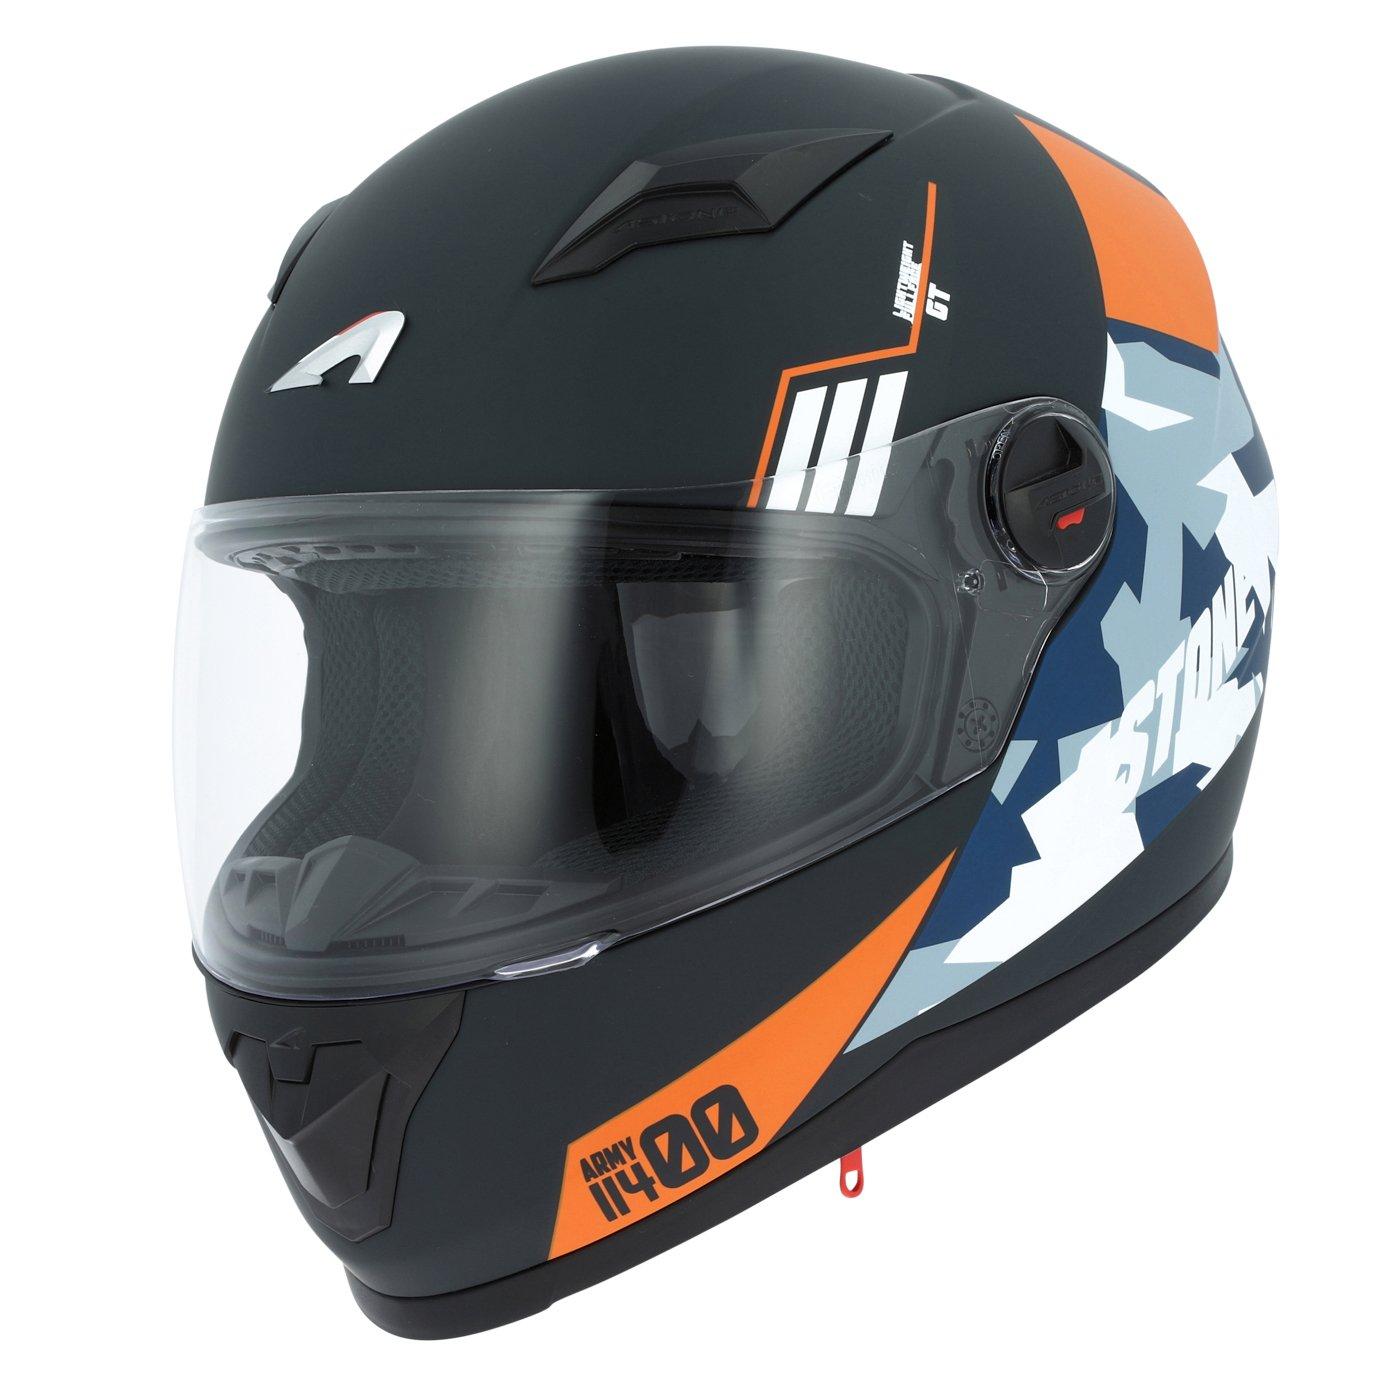 Amazon.es: Astone Helmets gt2g-army-bom casco Moto Integral GT, negro, talla M